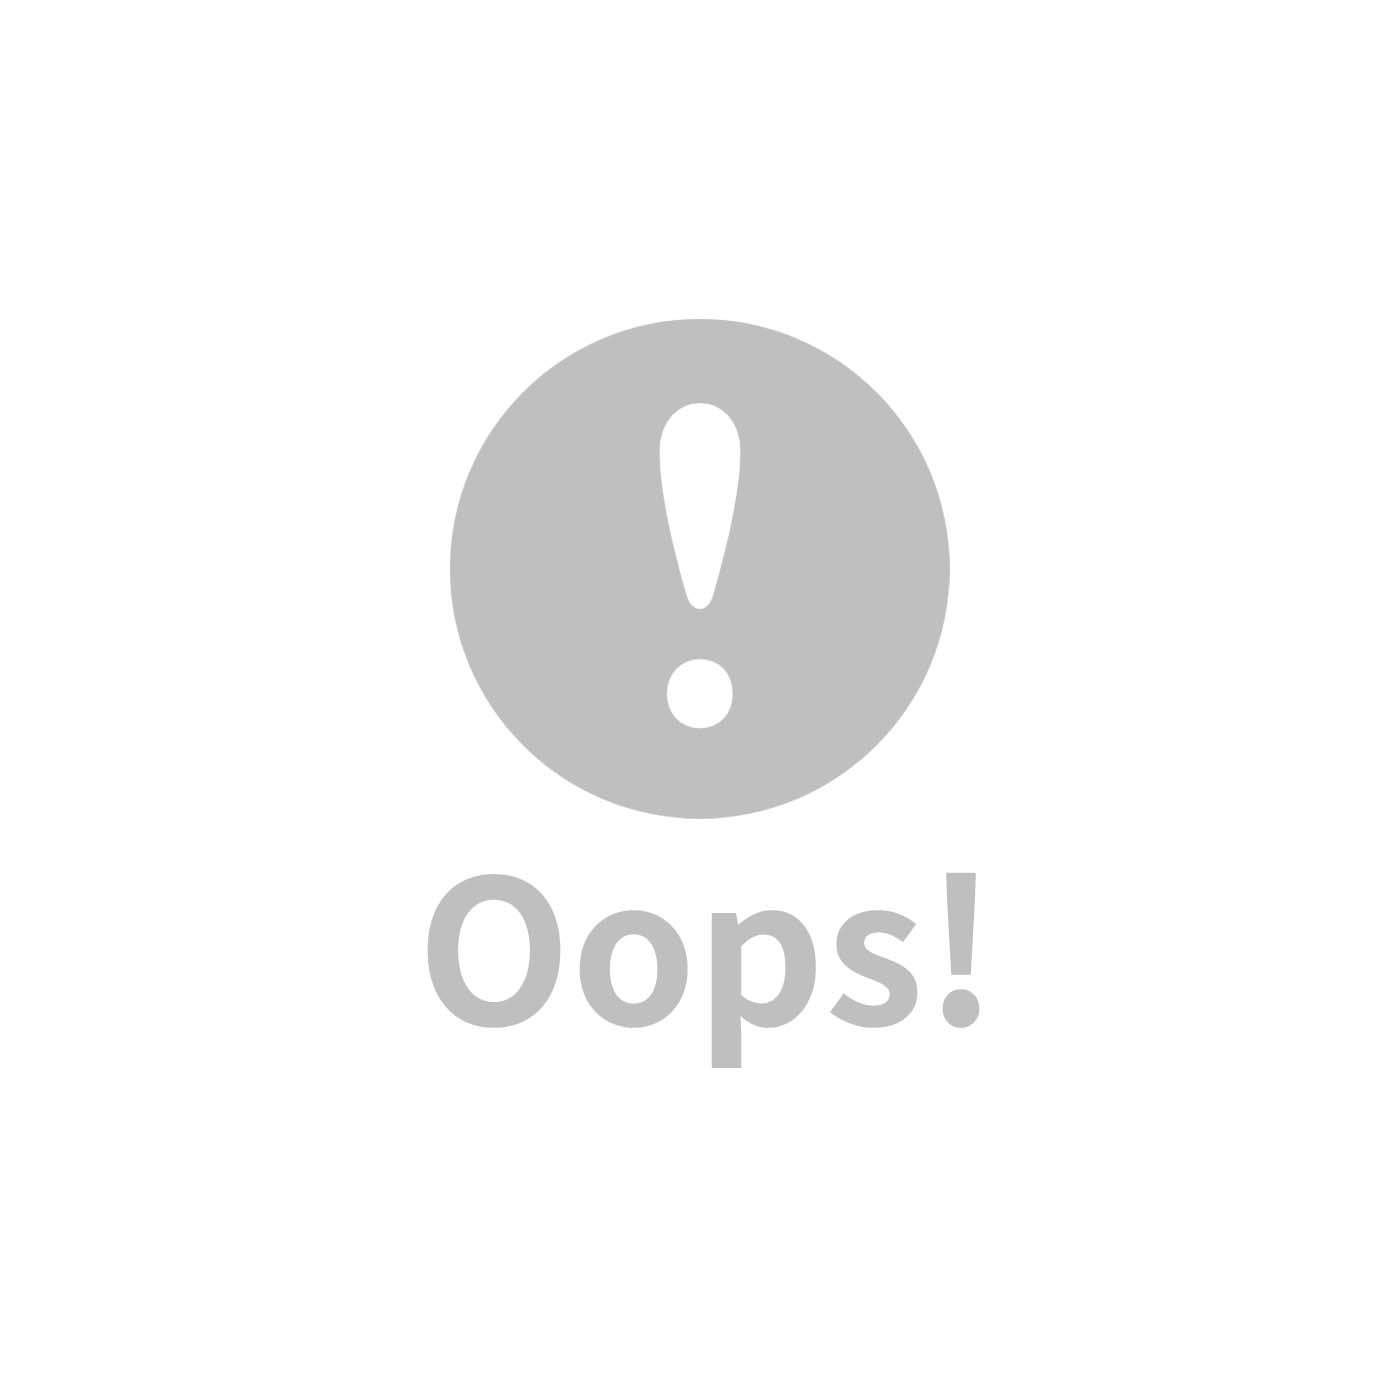 bebeduE 六合一 副食品聰明懶人包-附悶燒盒(巴塞隆納紅)